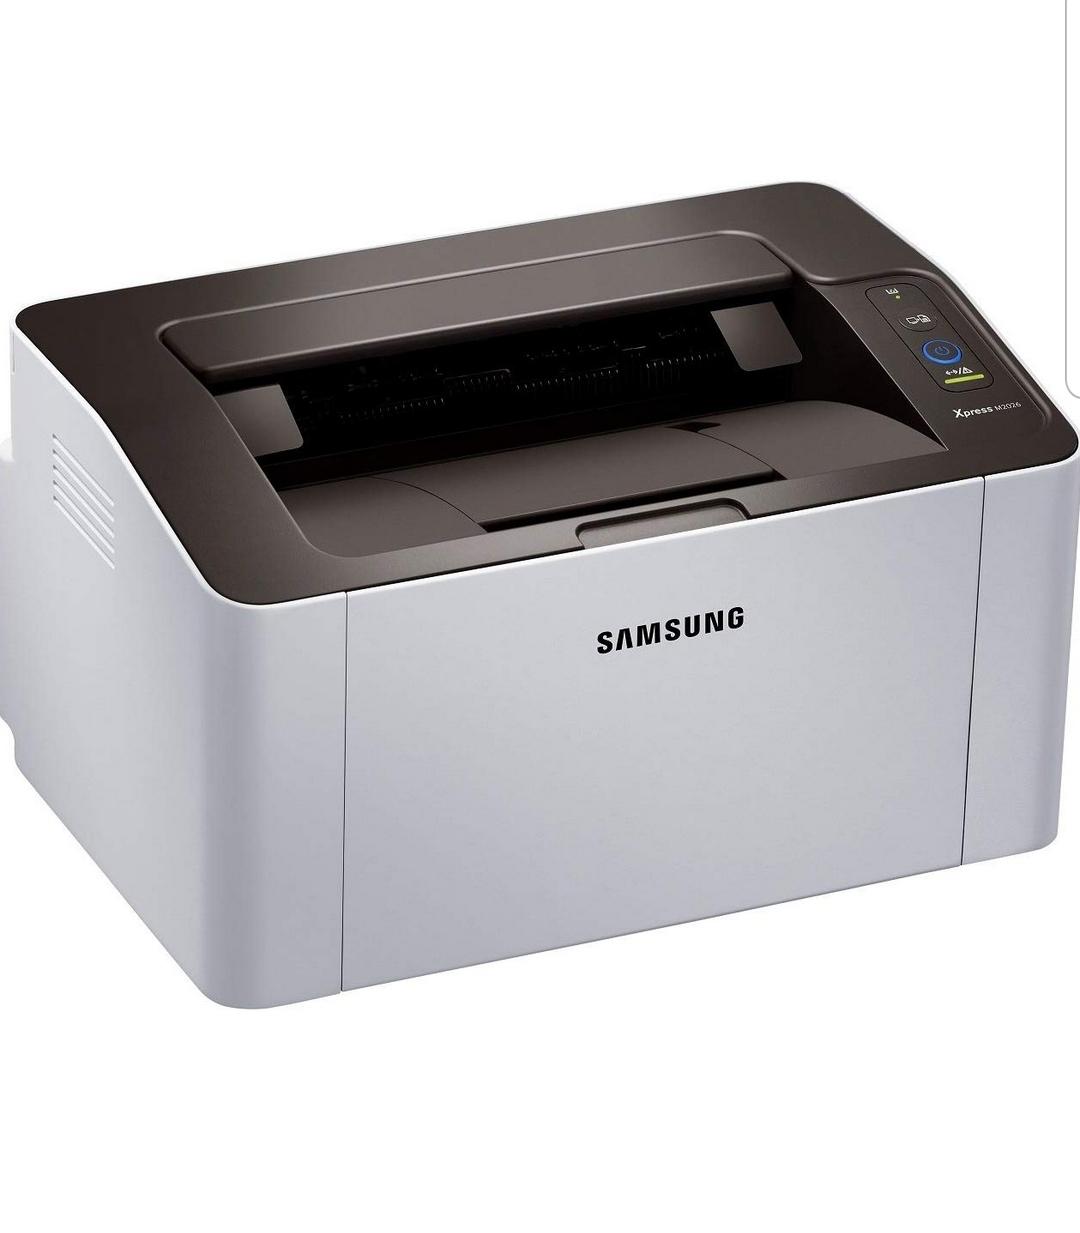 Samsung Xpress M2026 Monochrome Laser Printer only £39.99 Free delivery @ Amazon